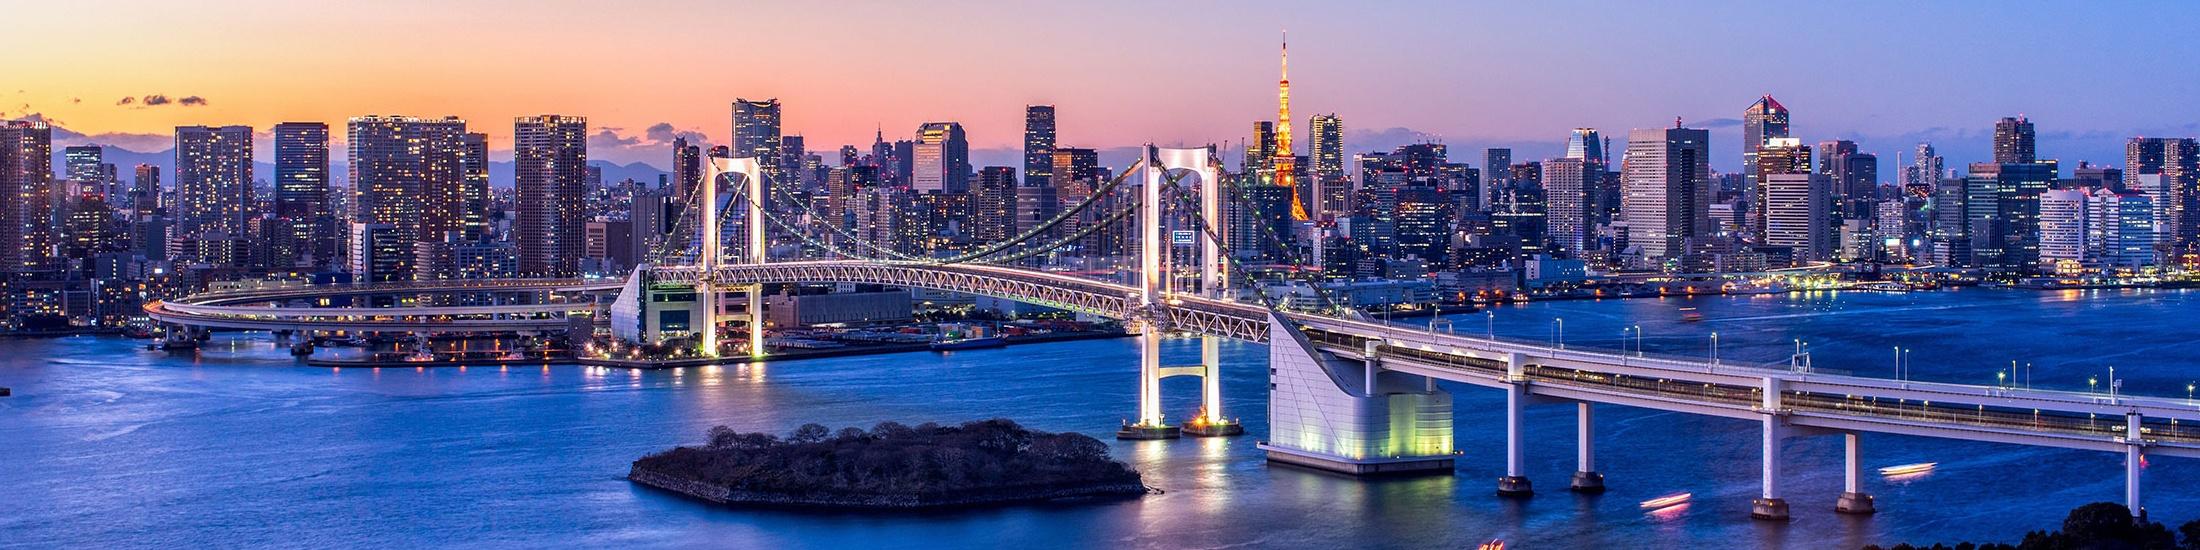 GenerationDigital-Tokyo1.jpg